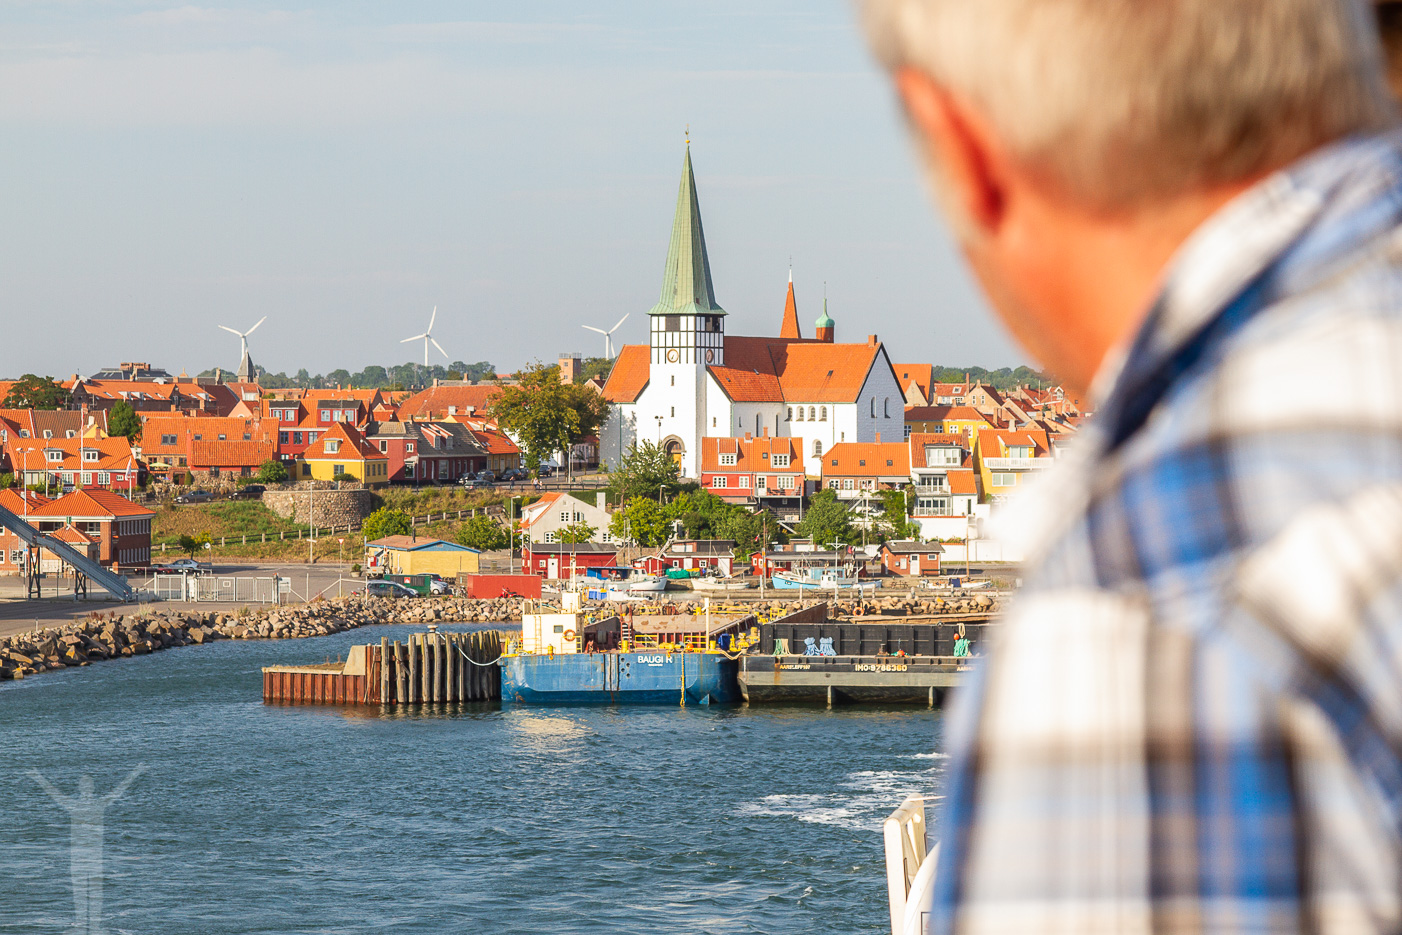 Hejdå Bornholm